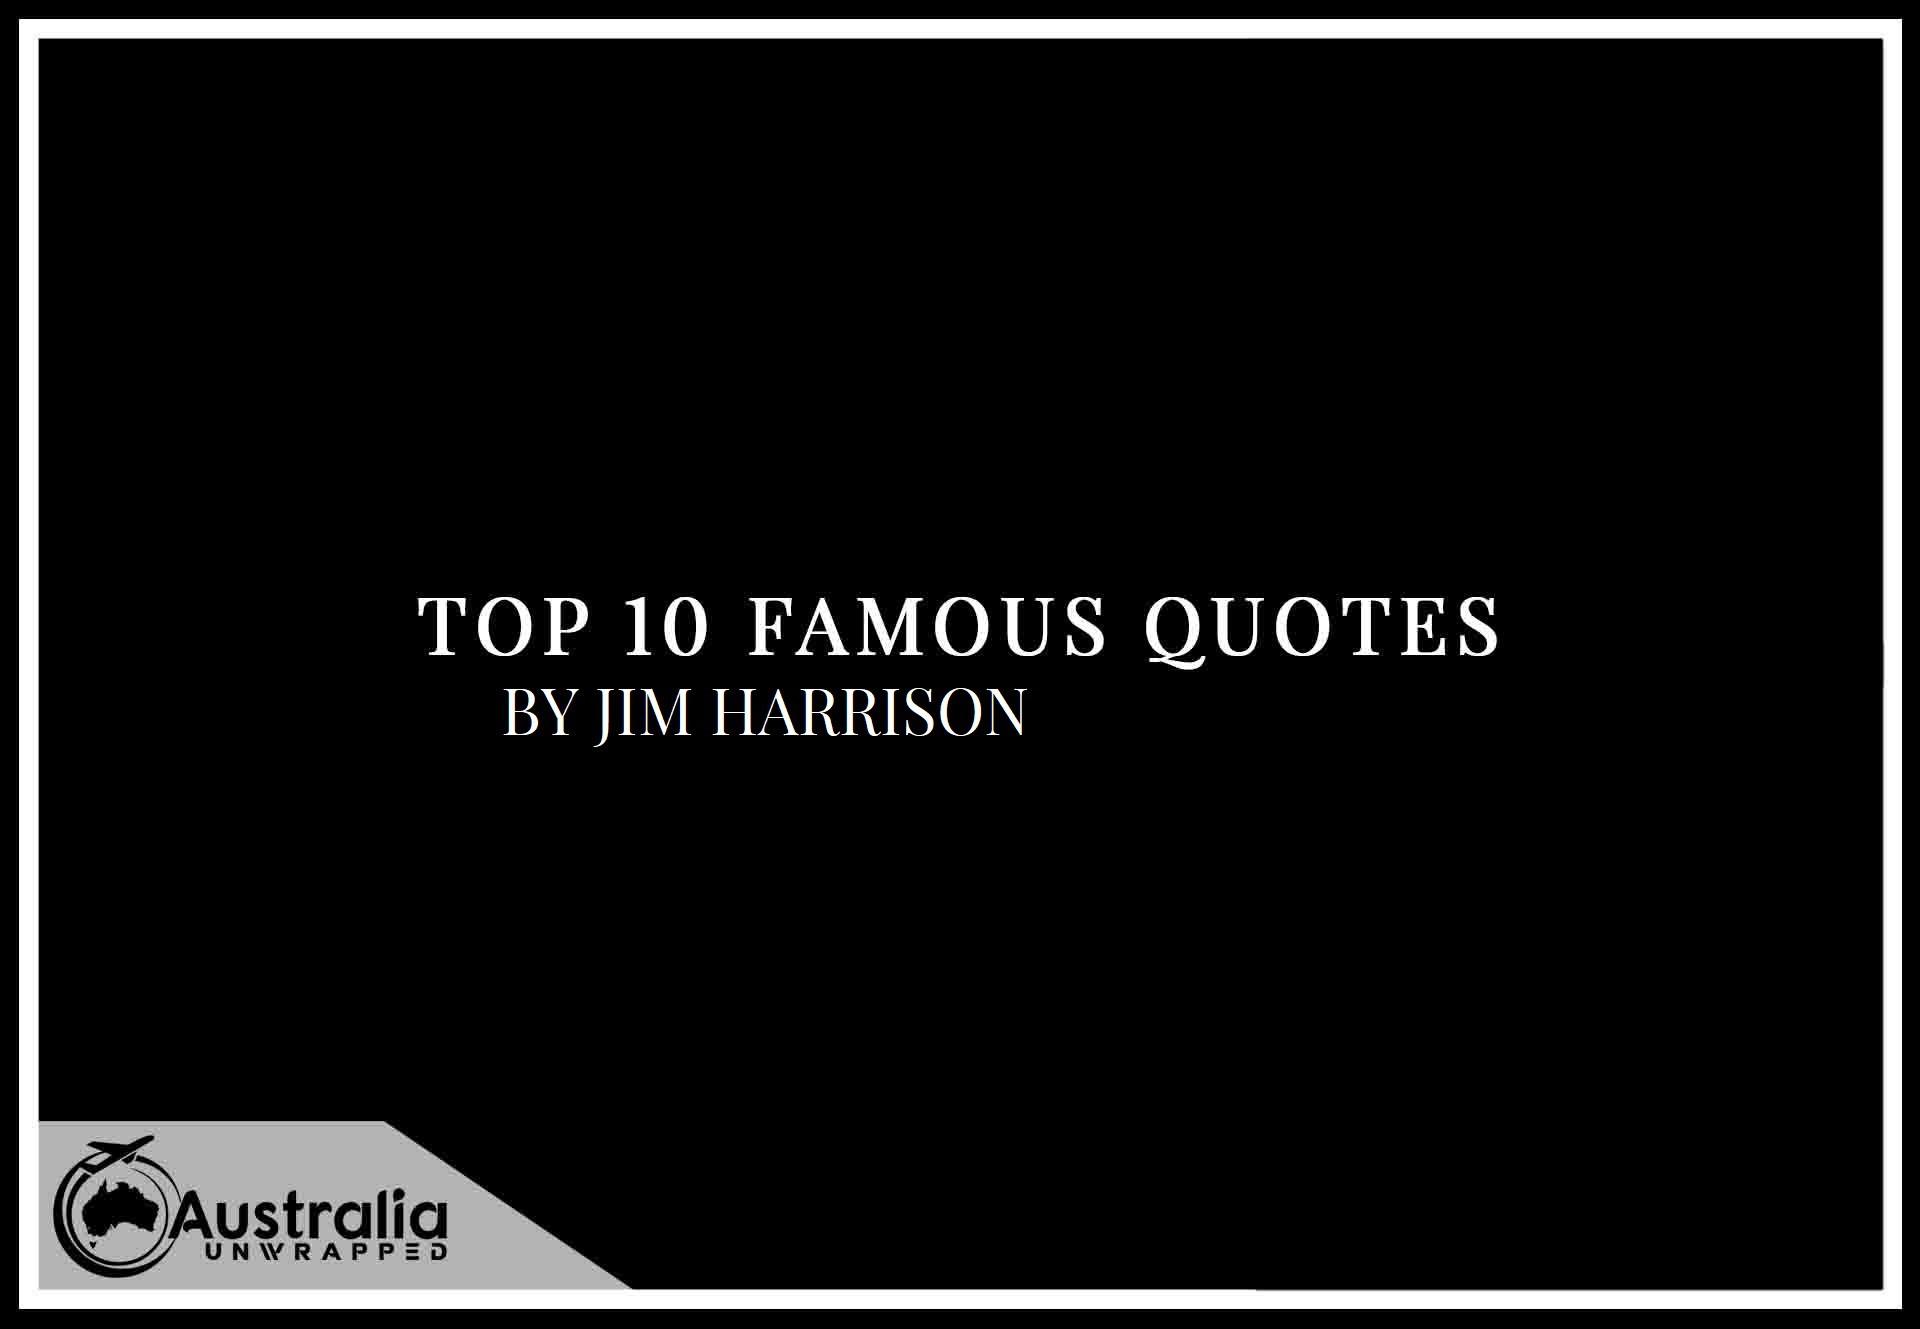 Top 10 Famous Quotes by Author Jim Harrison